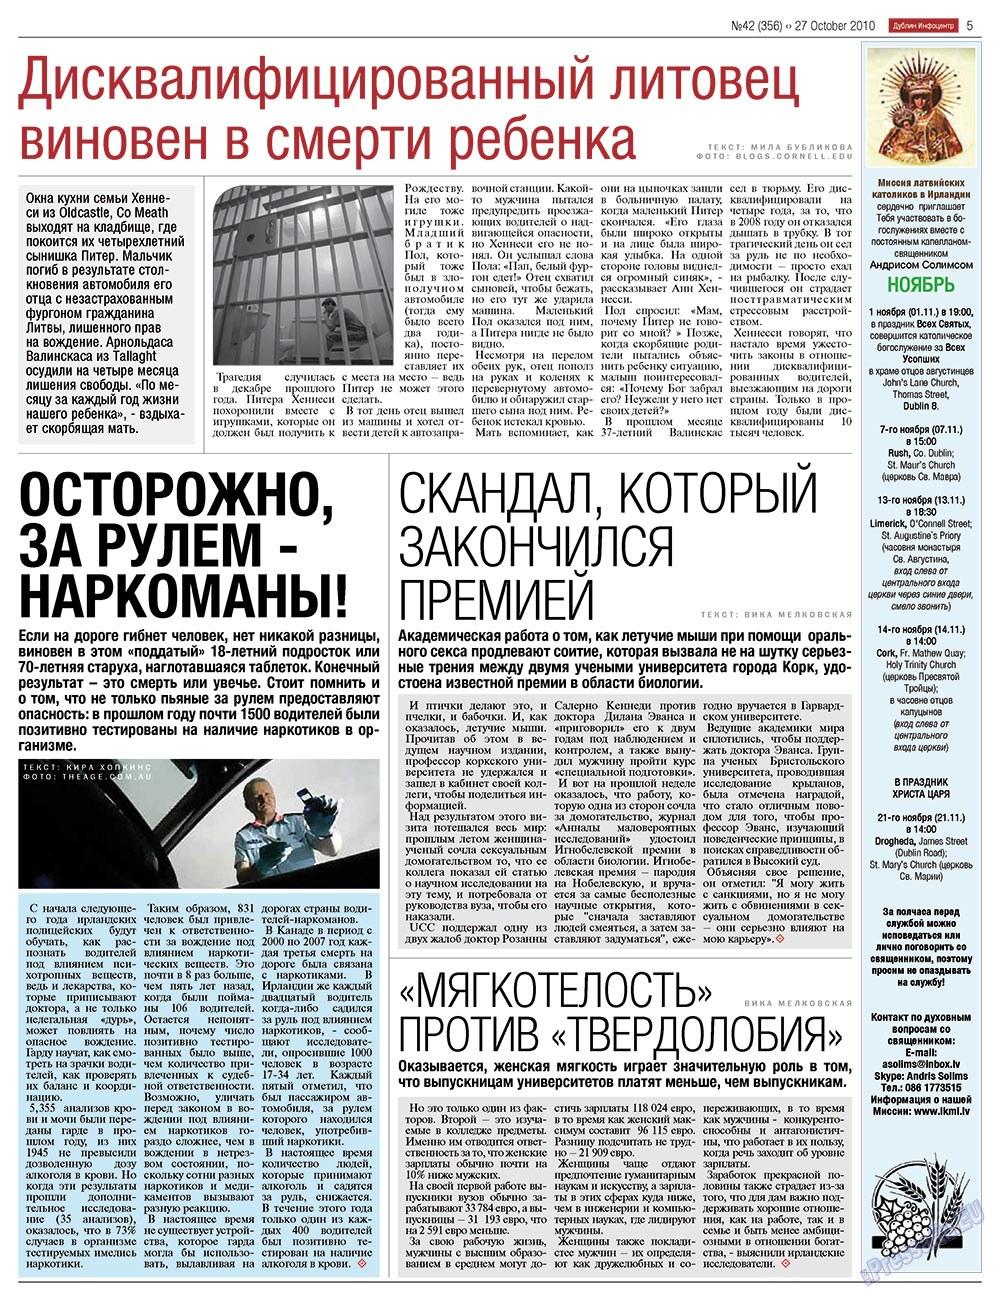 Дублин инфоцентр (газета). 2010 год, номер 42, стр. 5